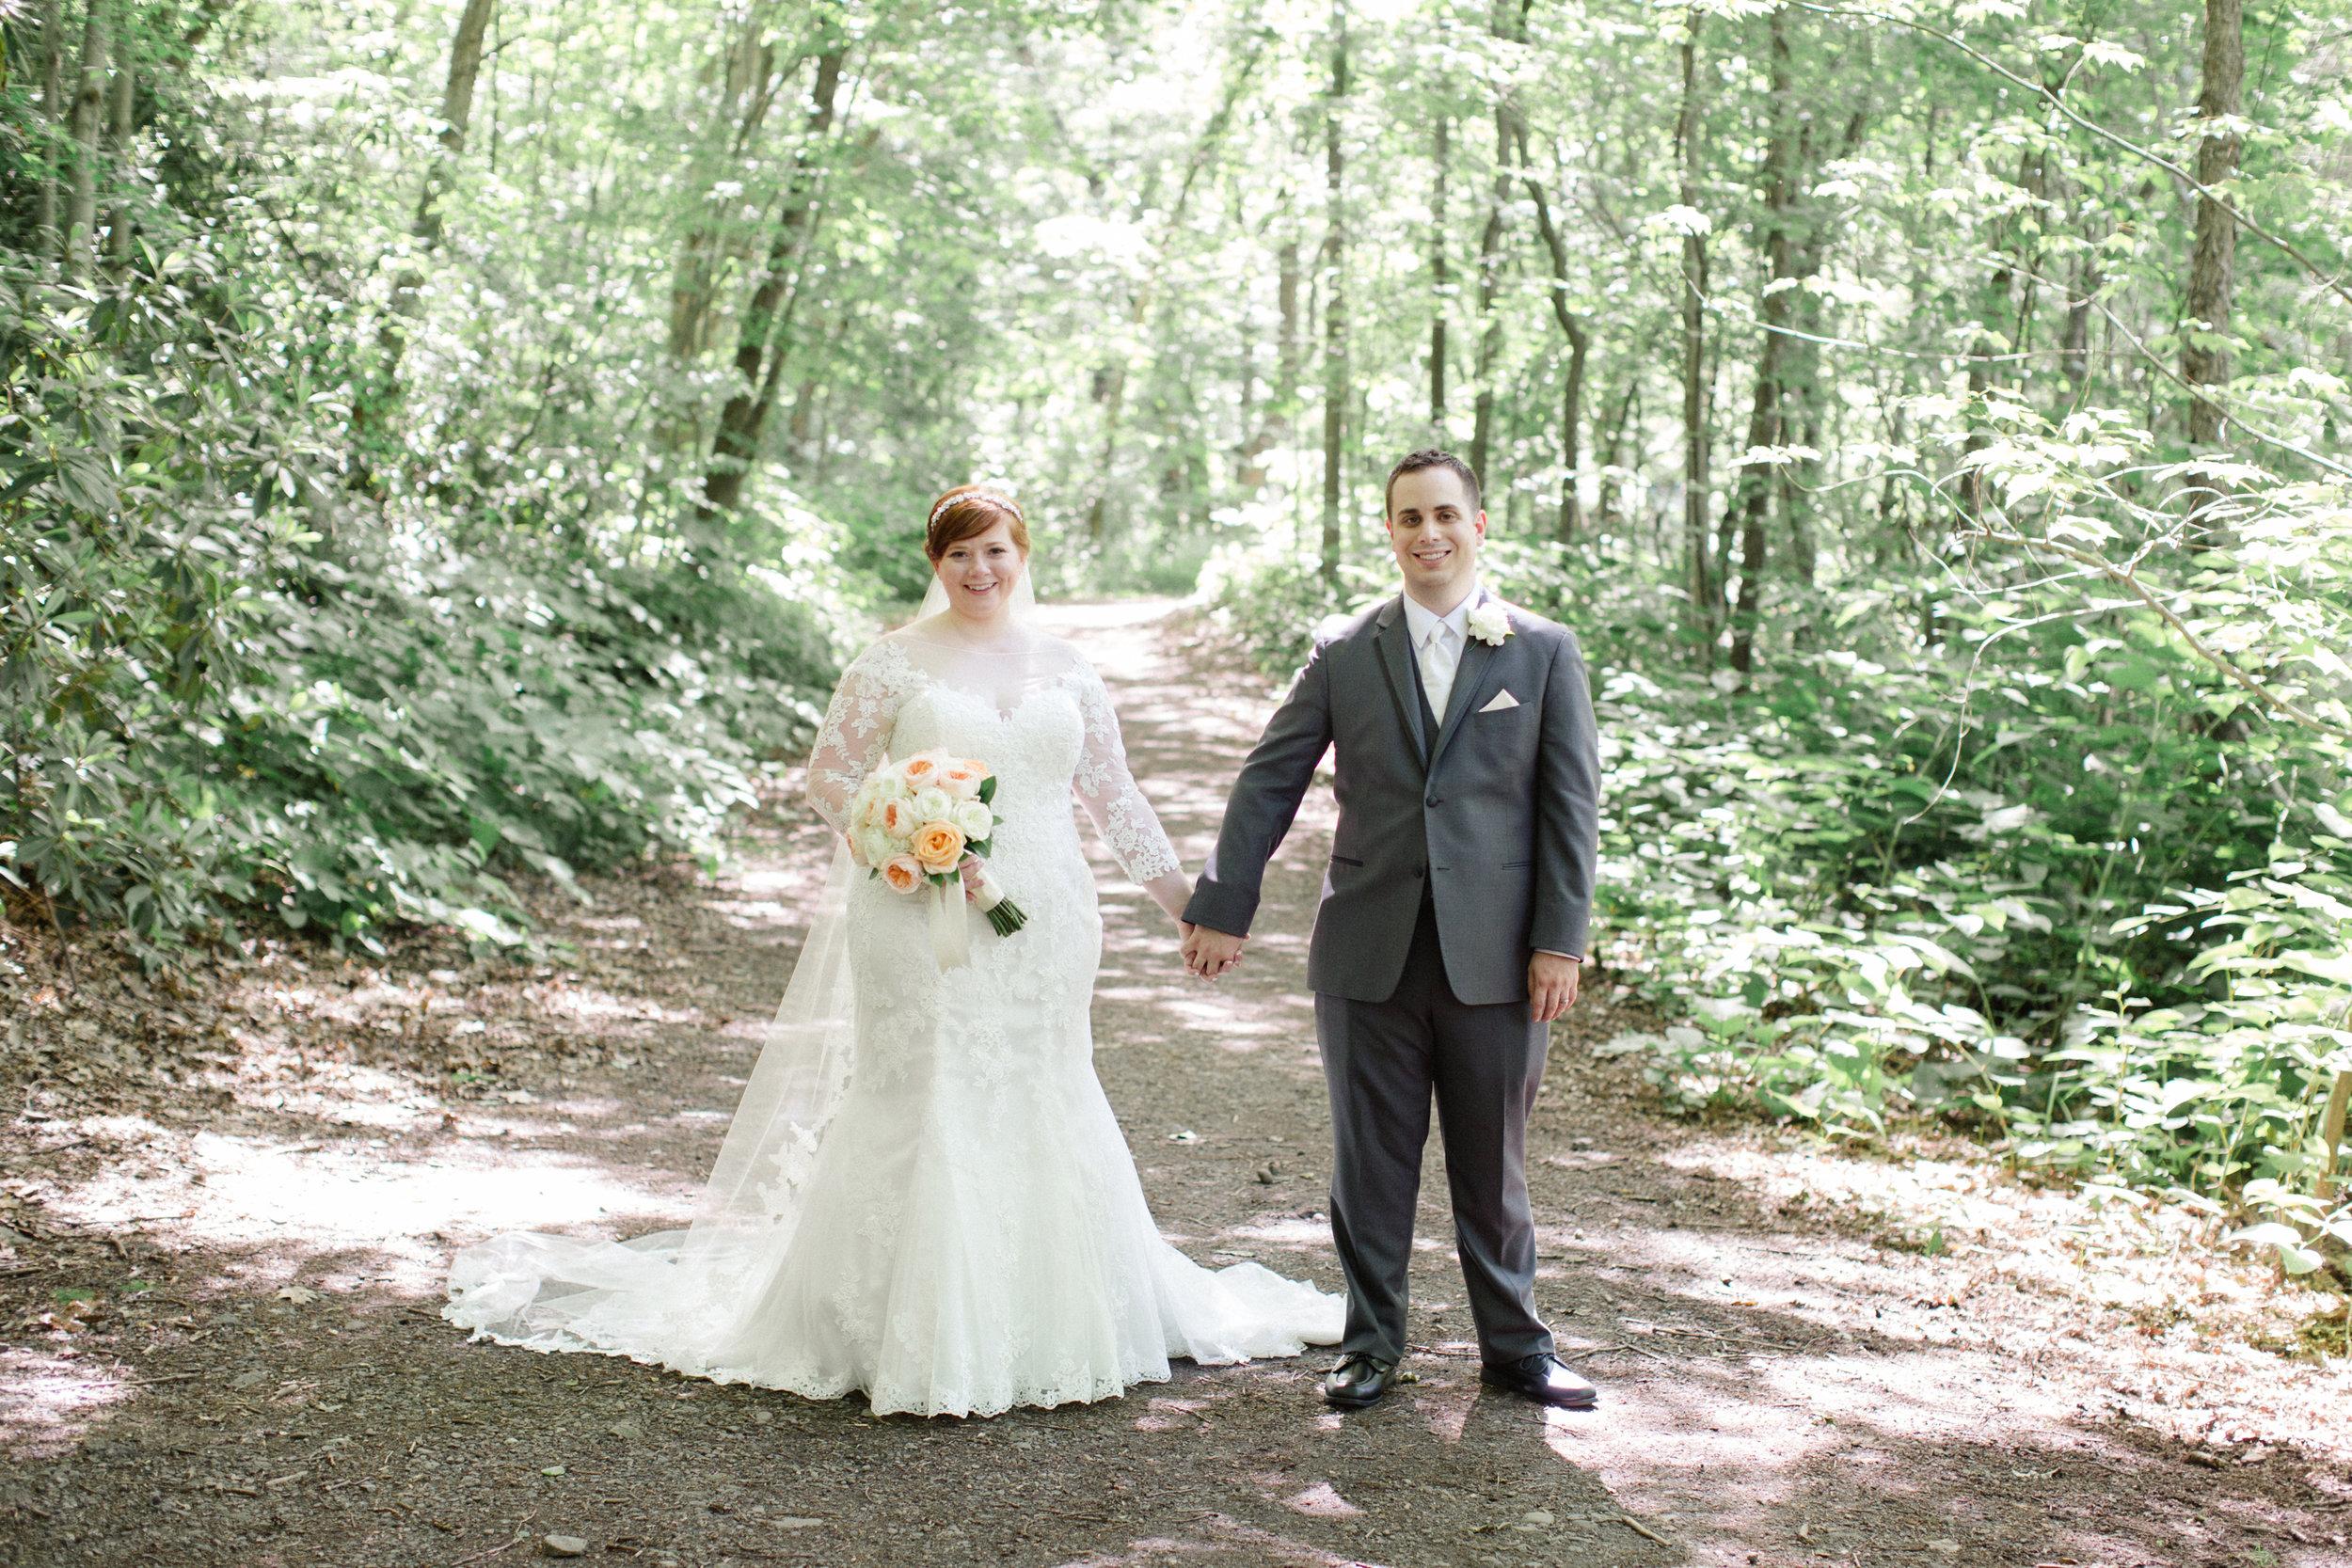 Fiorellis Wedding Photos_JDP-117.jpg